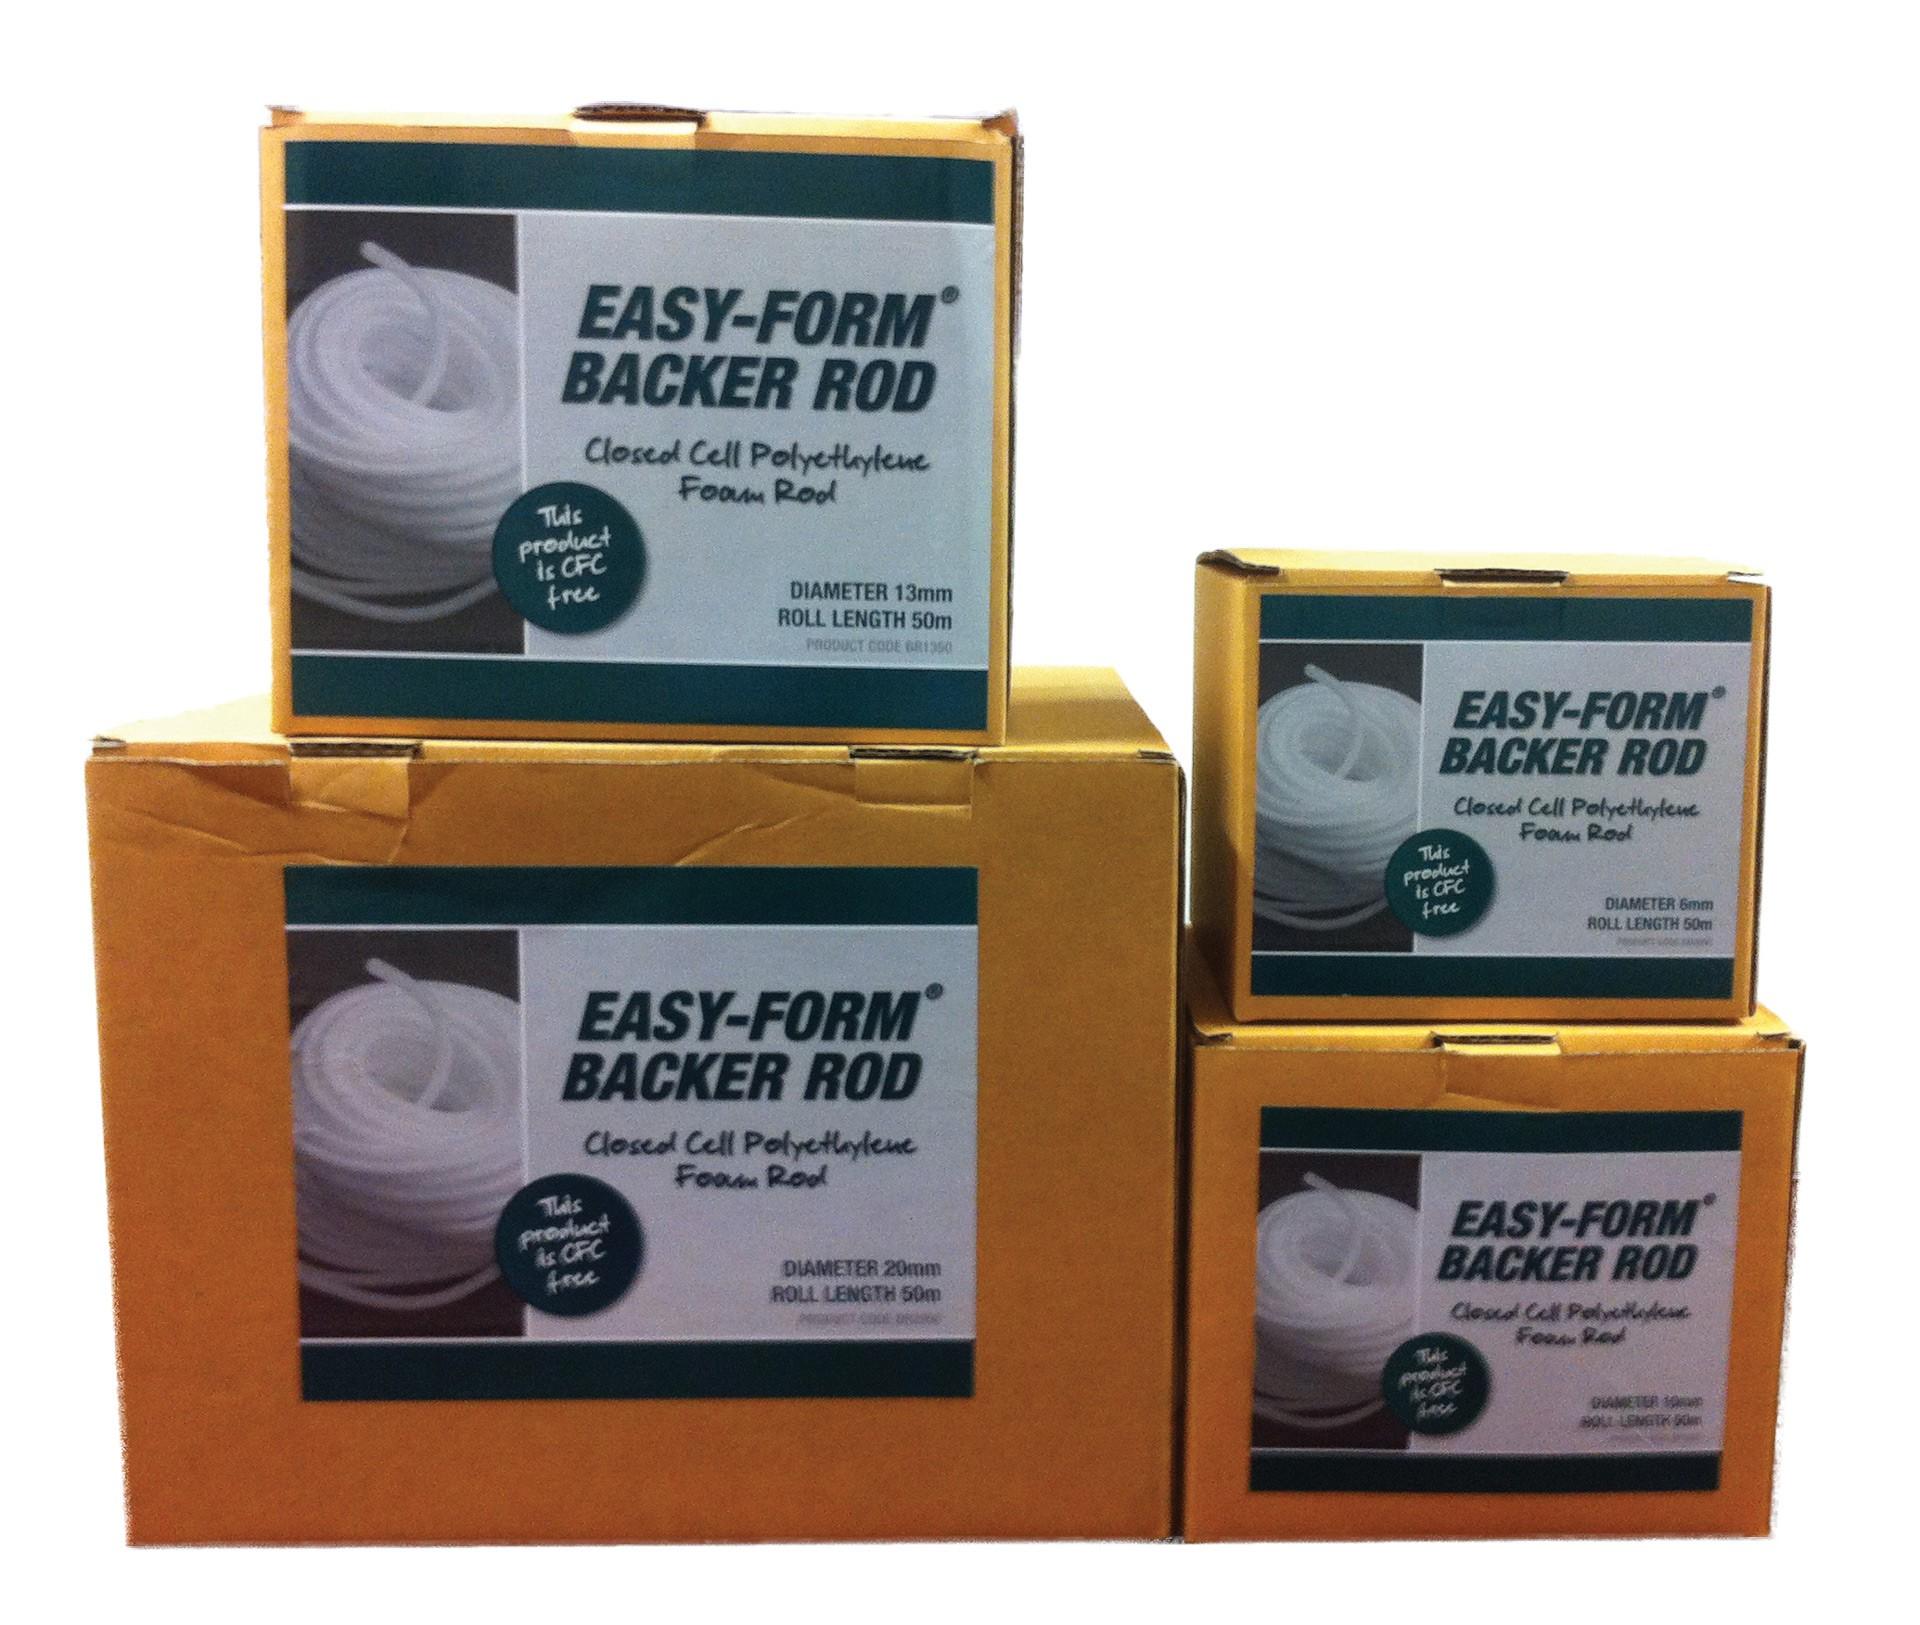 easy-form-backer-rod-1